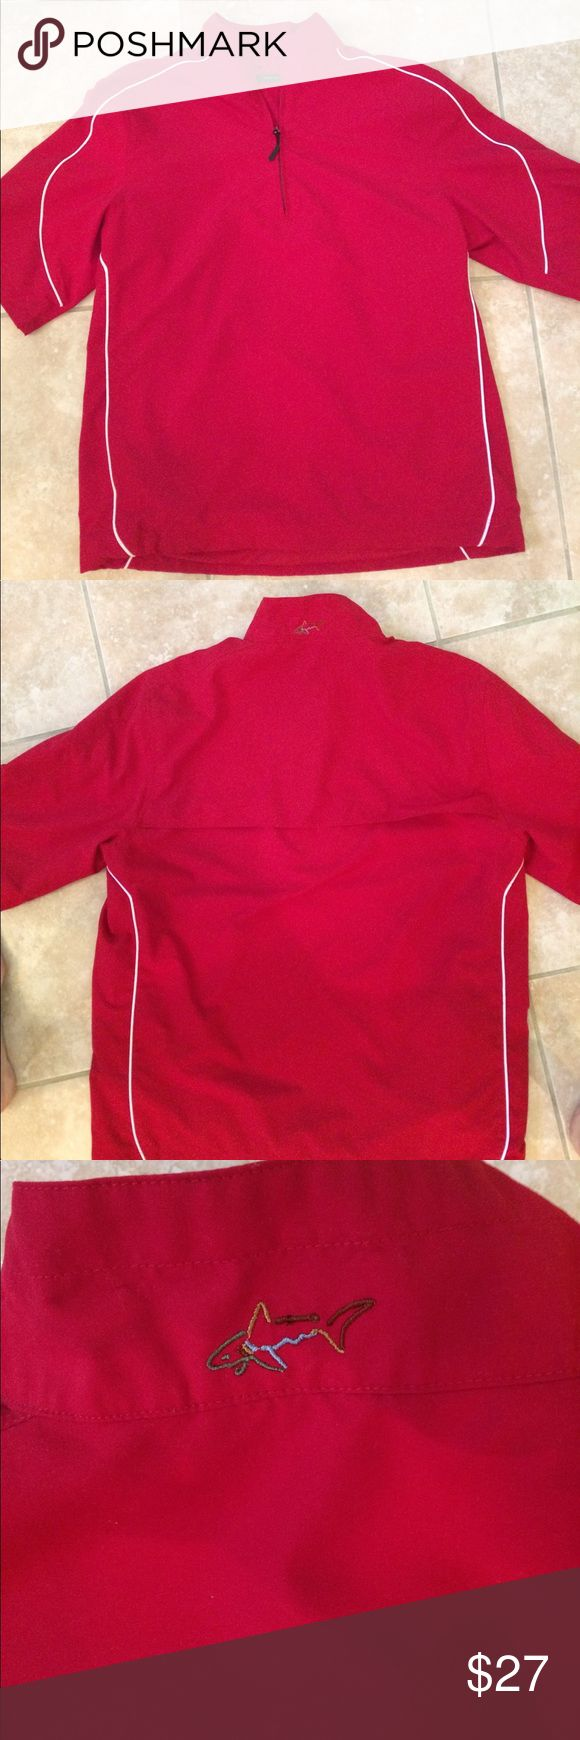 Greg Norman Collection. Greg Norman Collection Men's 1/4 Zip Short Sleeve Weather Knit Jacket. Waterproof fabric. Wind Resistant. Comfort Stretch. Like new. Barn Red. Greg Norman Jackets & Coats Windbreakers